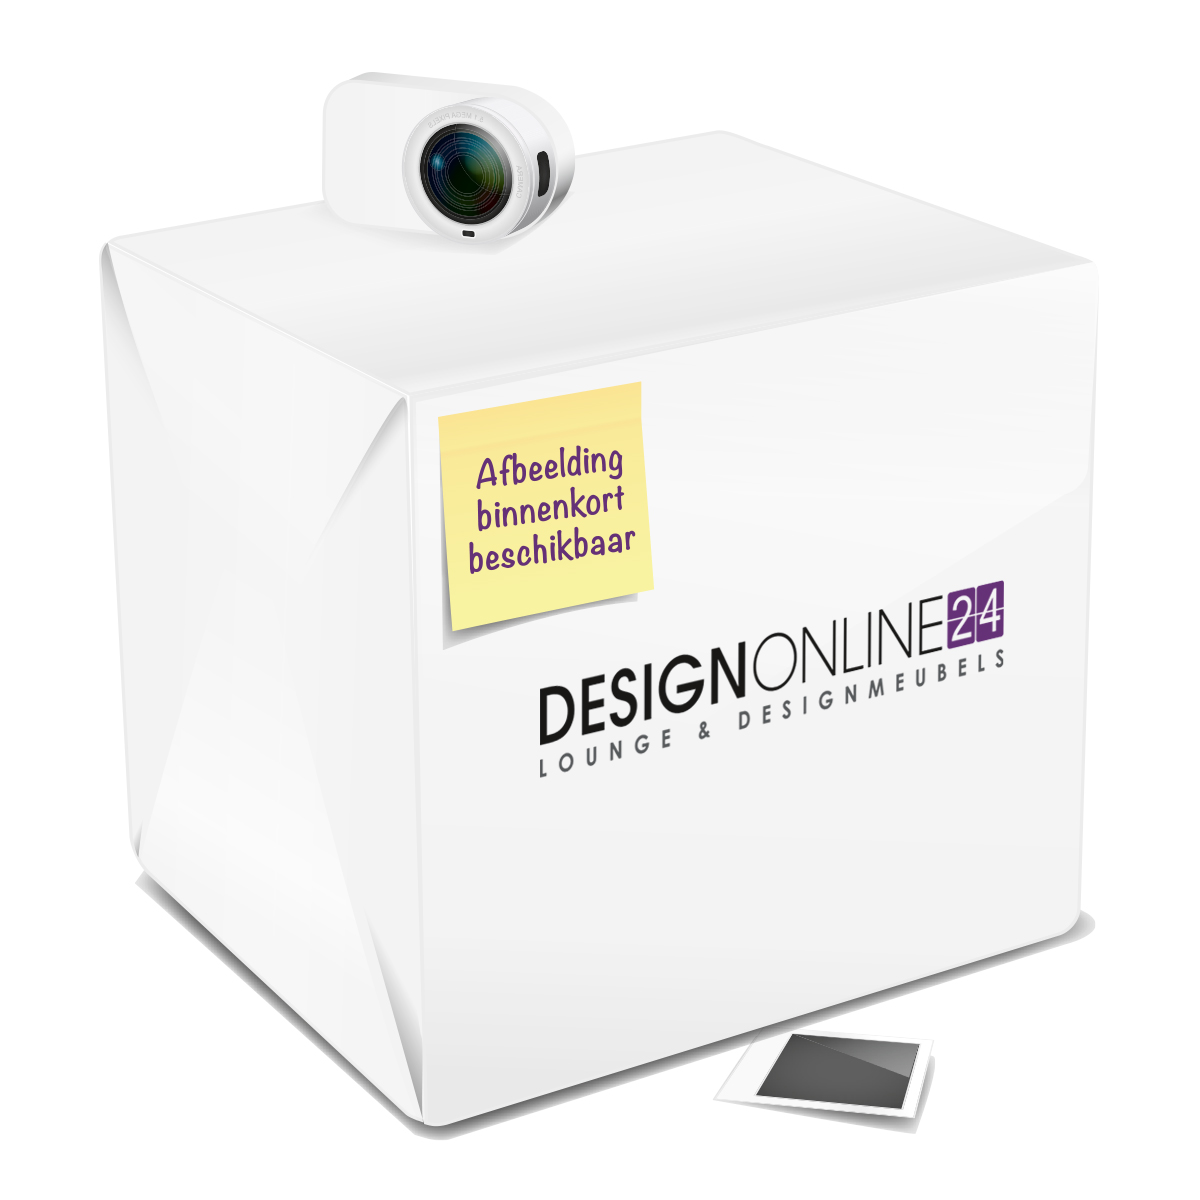 Cumi Bijzettafel hout wit hoogglans Zuiver   DesignOnline24